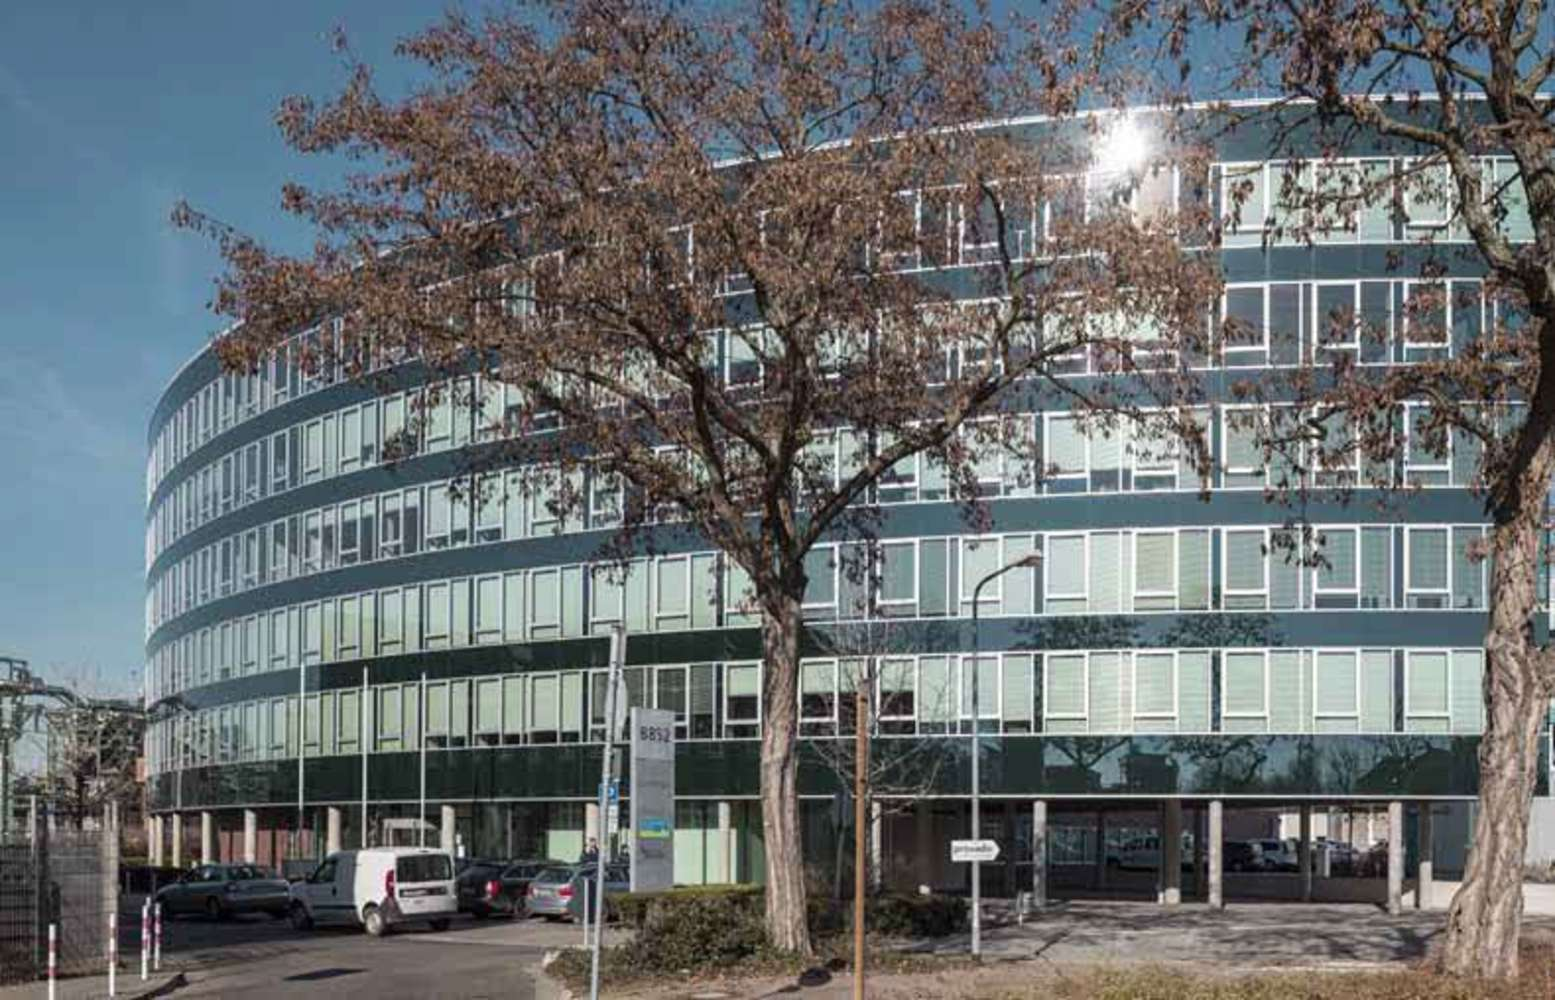 Büros Frankfurt am main, 65926 - Büro - Frankfurt am Main, Höchst - F2035 - 9518031